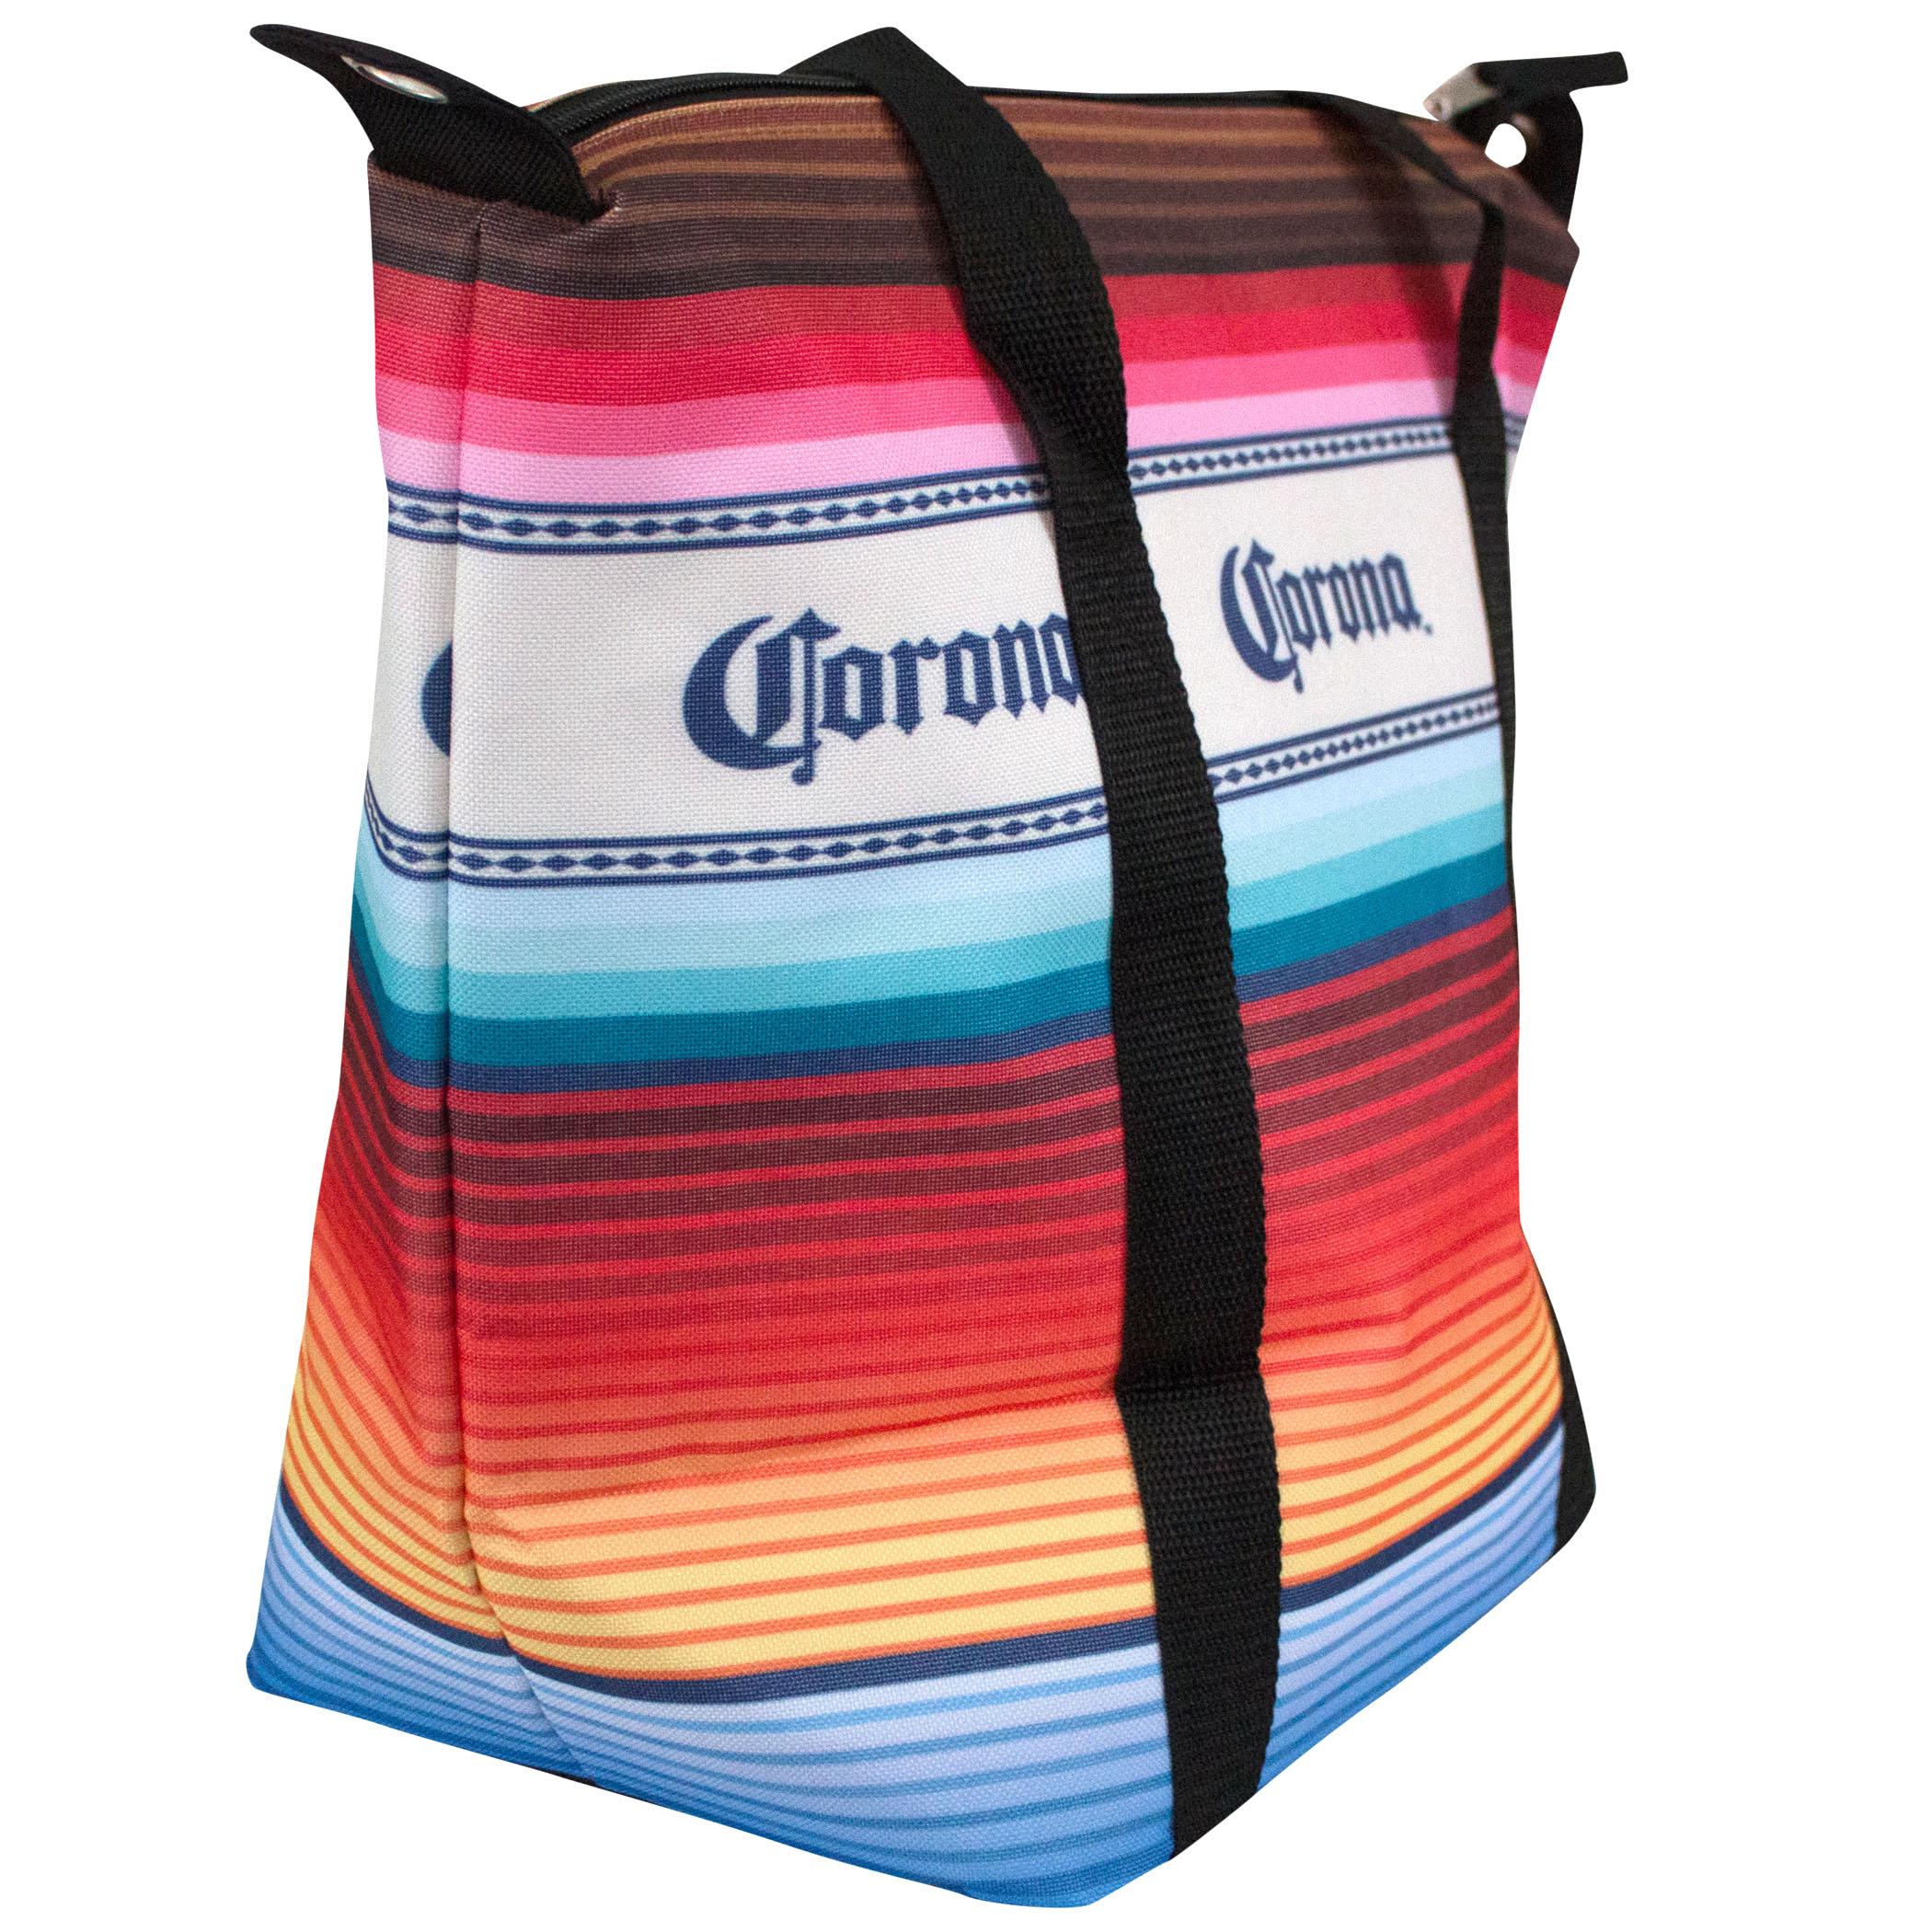 Corona Extra Multicolored Beach Blanket Cooler Bag